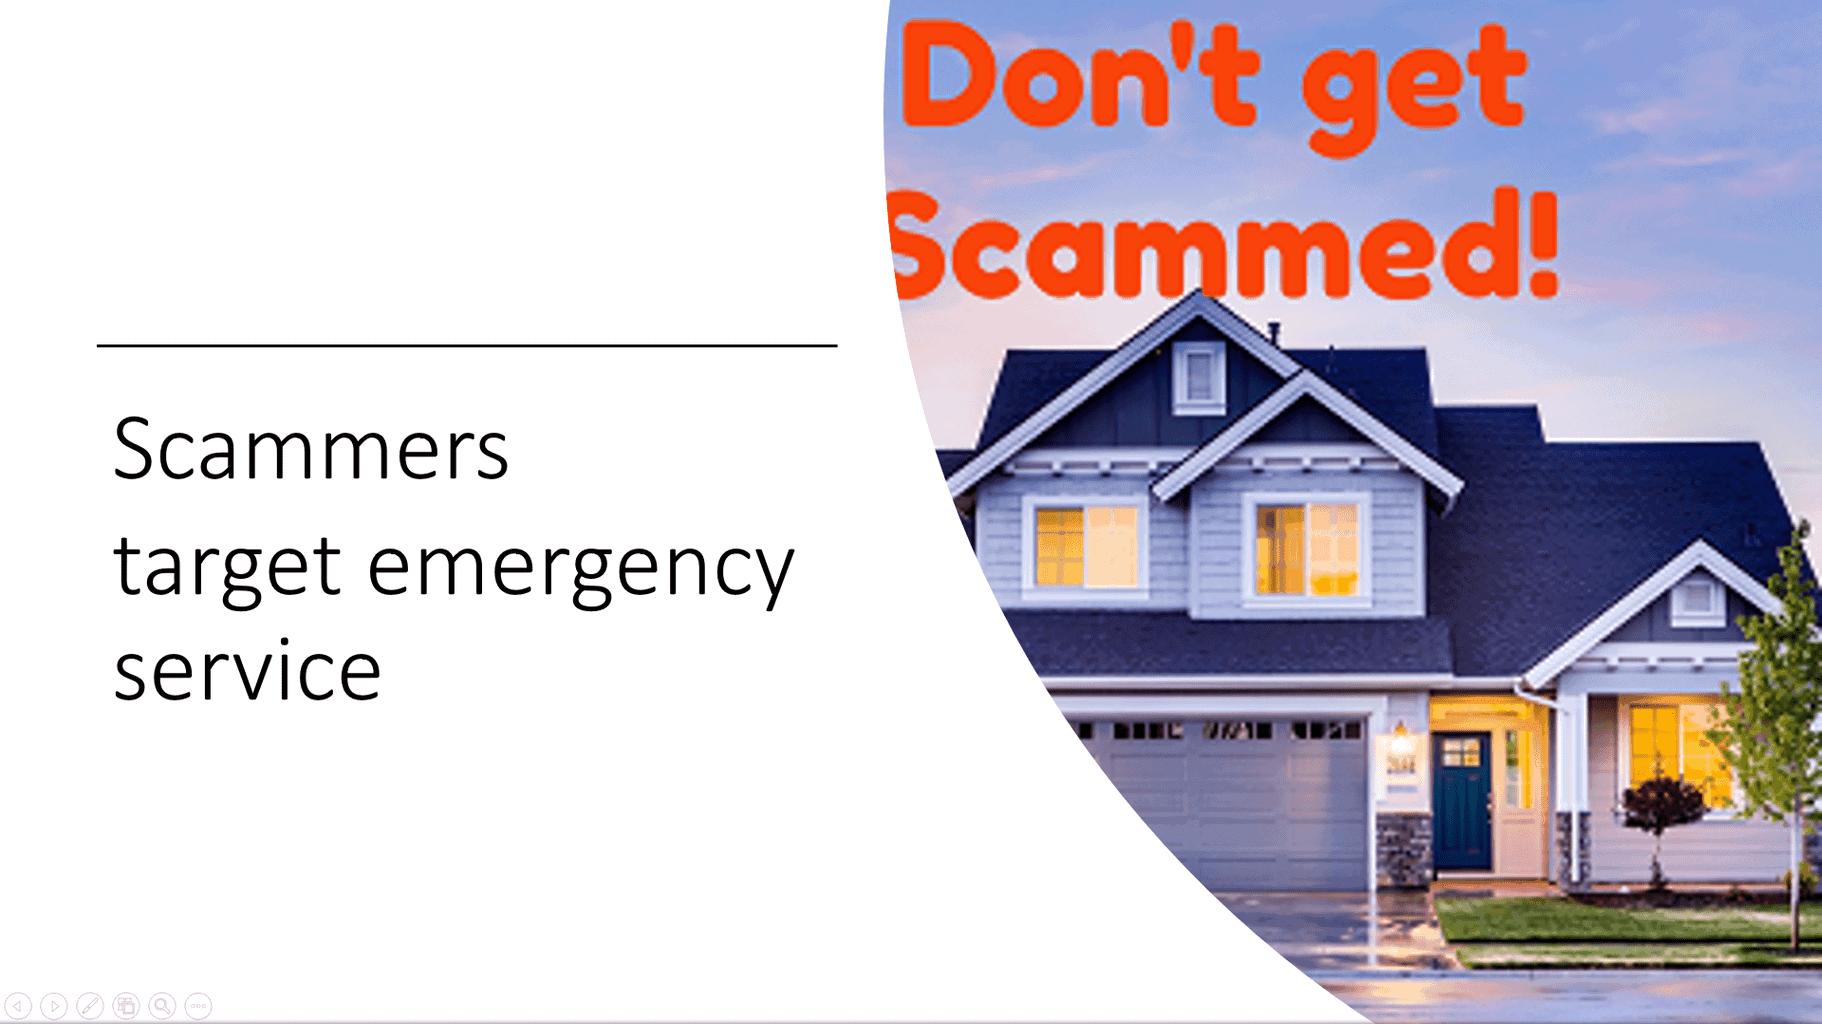 Garage Door Repairs are a Target: Don't get Scammed